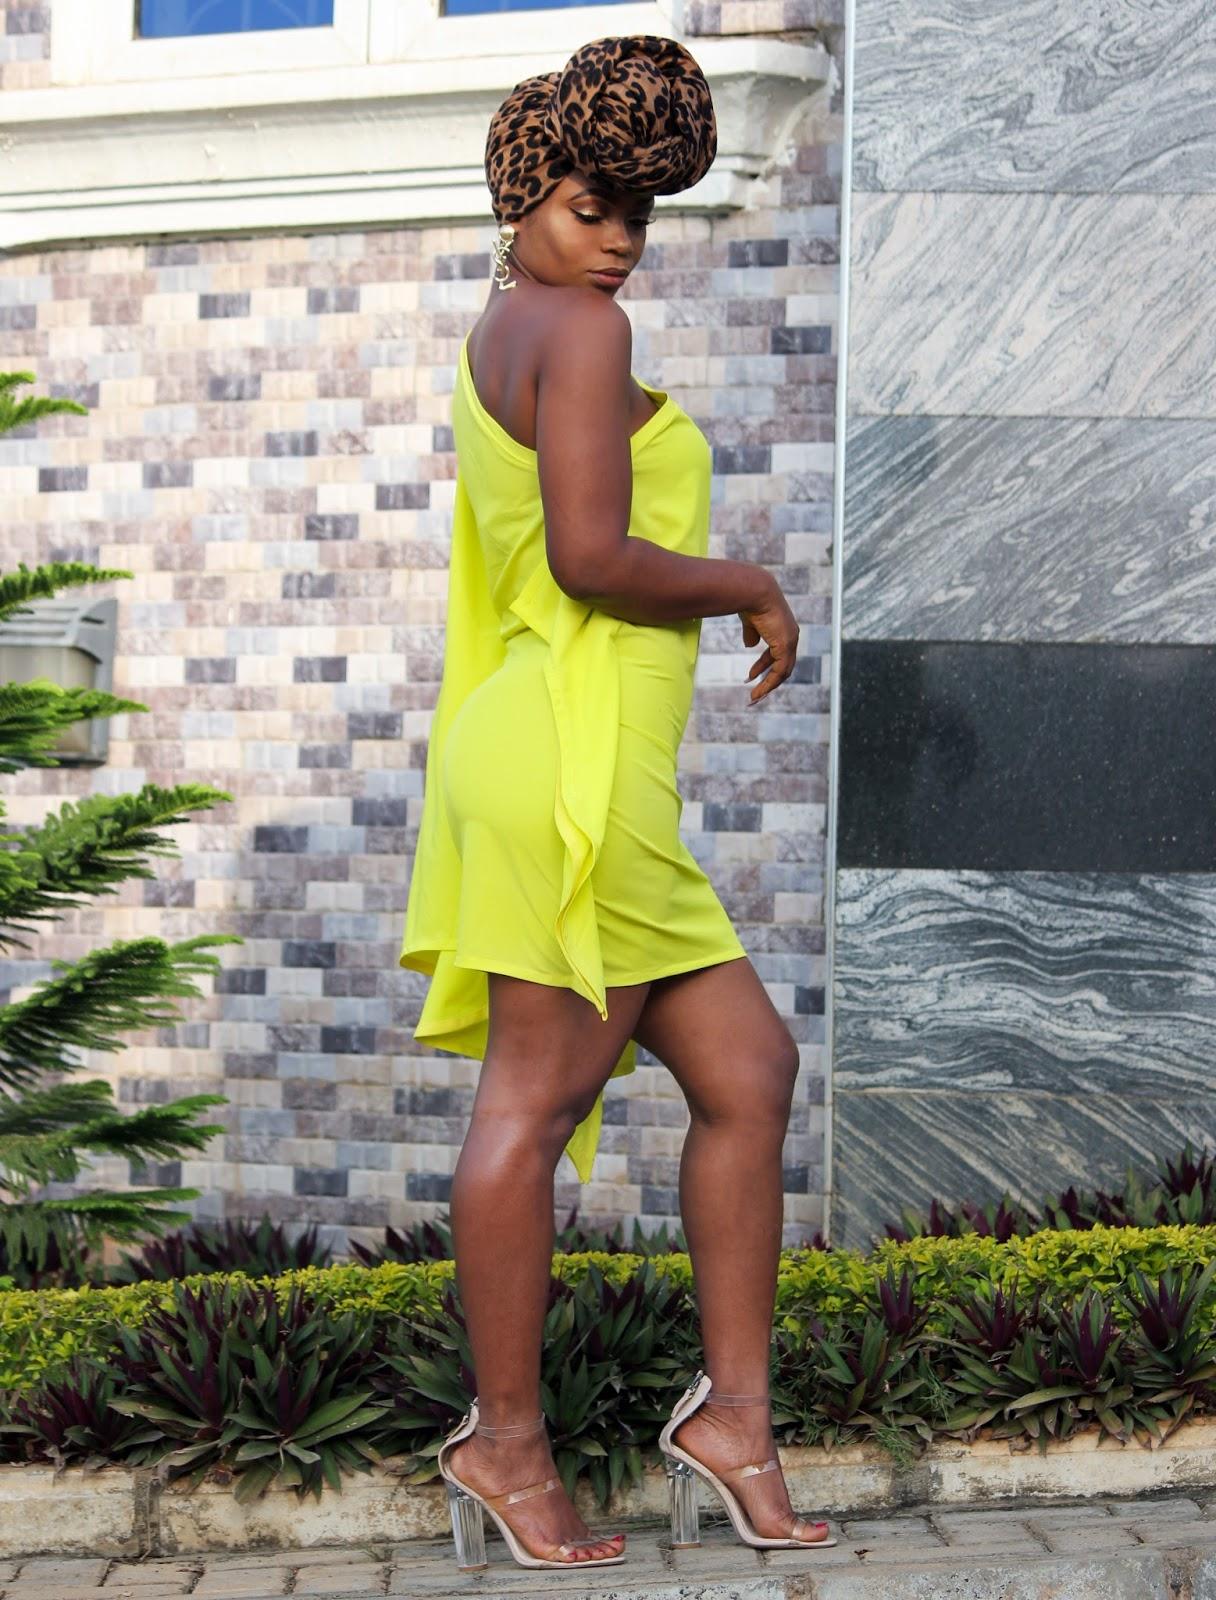 ONE SHOULDER DRESS - Porshher One Shoulder Bat-wing Style Dress in Neon